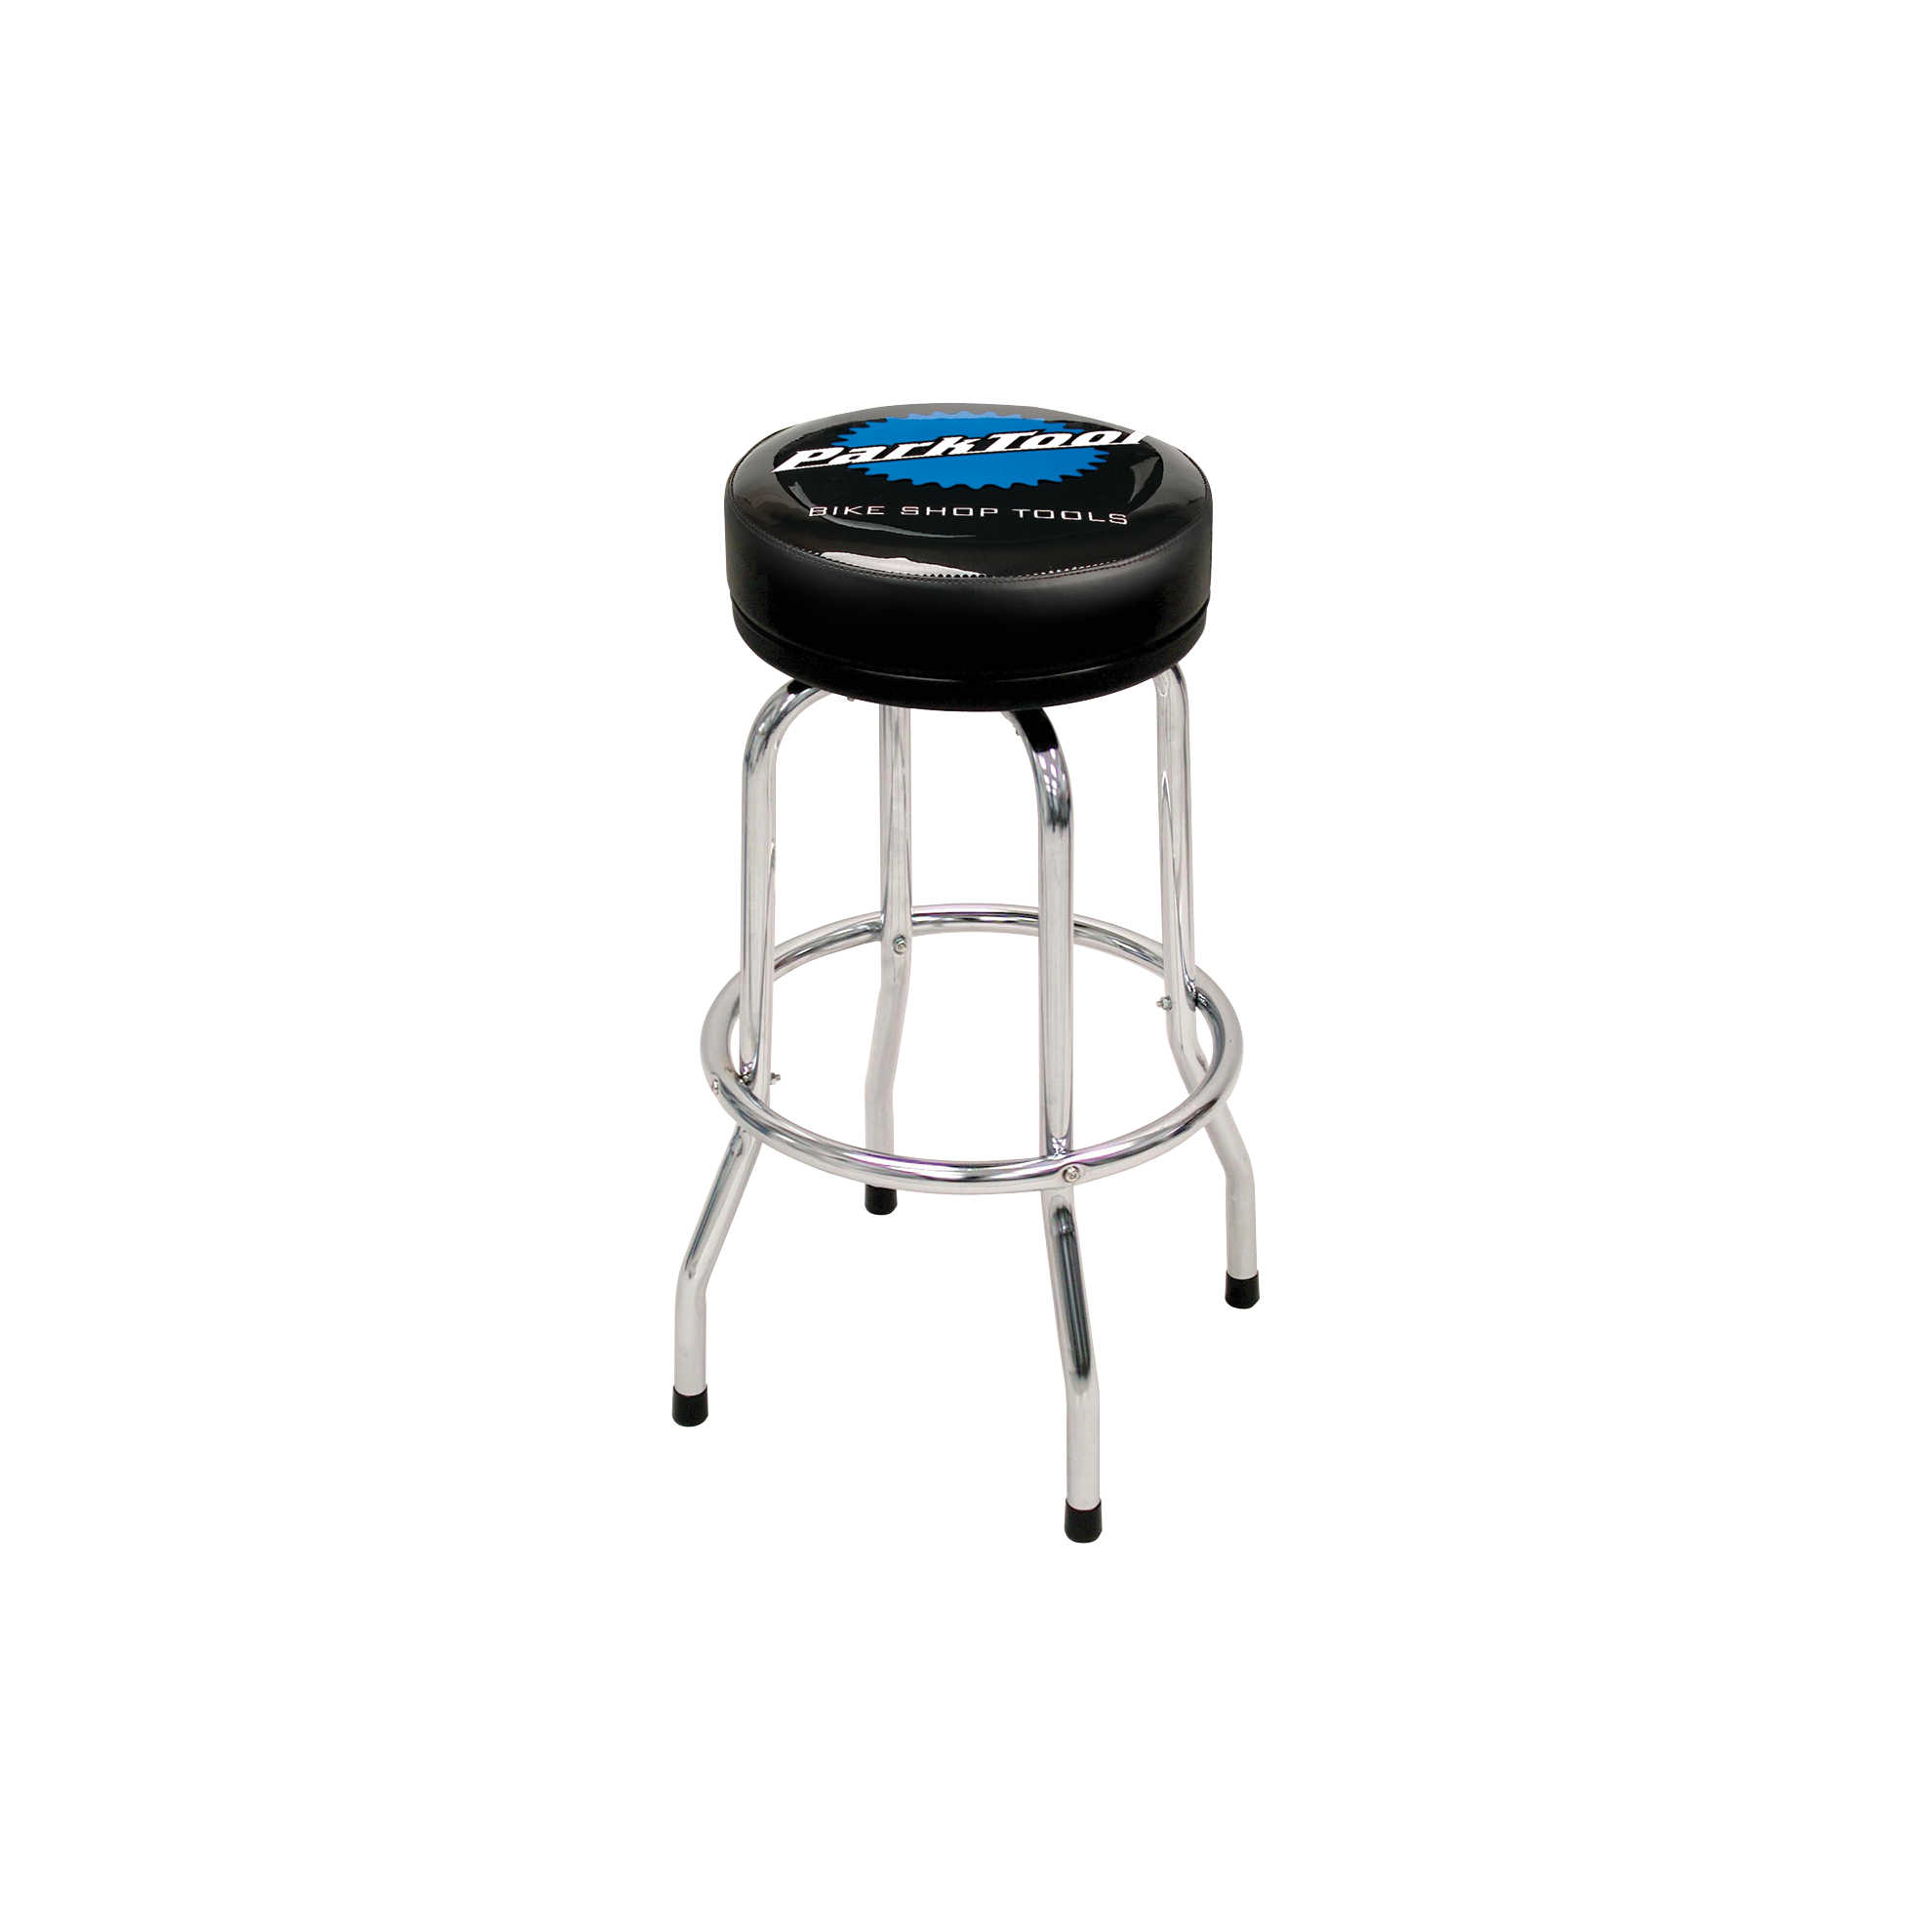 personalized monogrammed of shop stools bar inch logo stool garage photo size x full